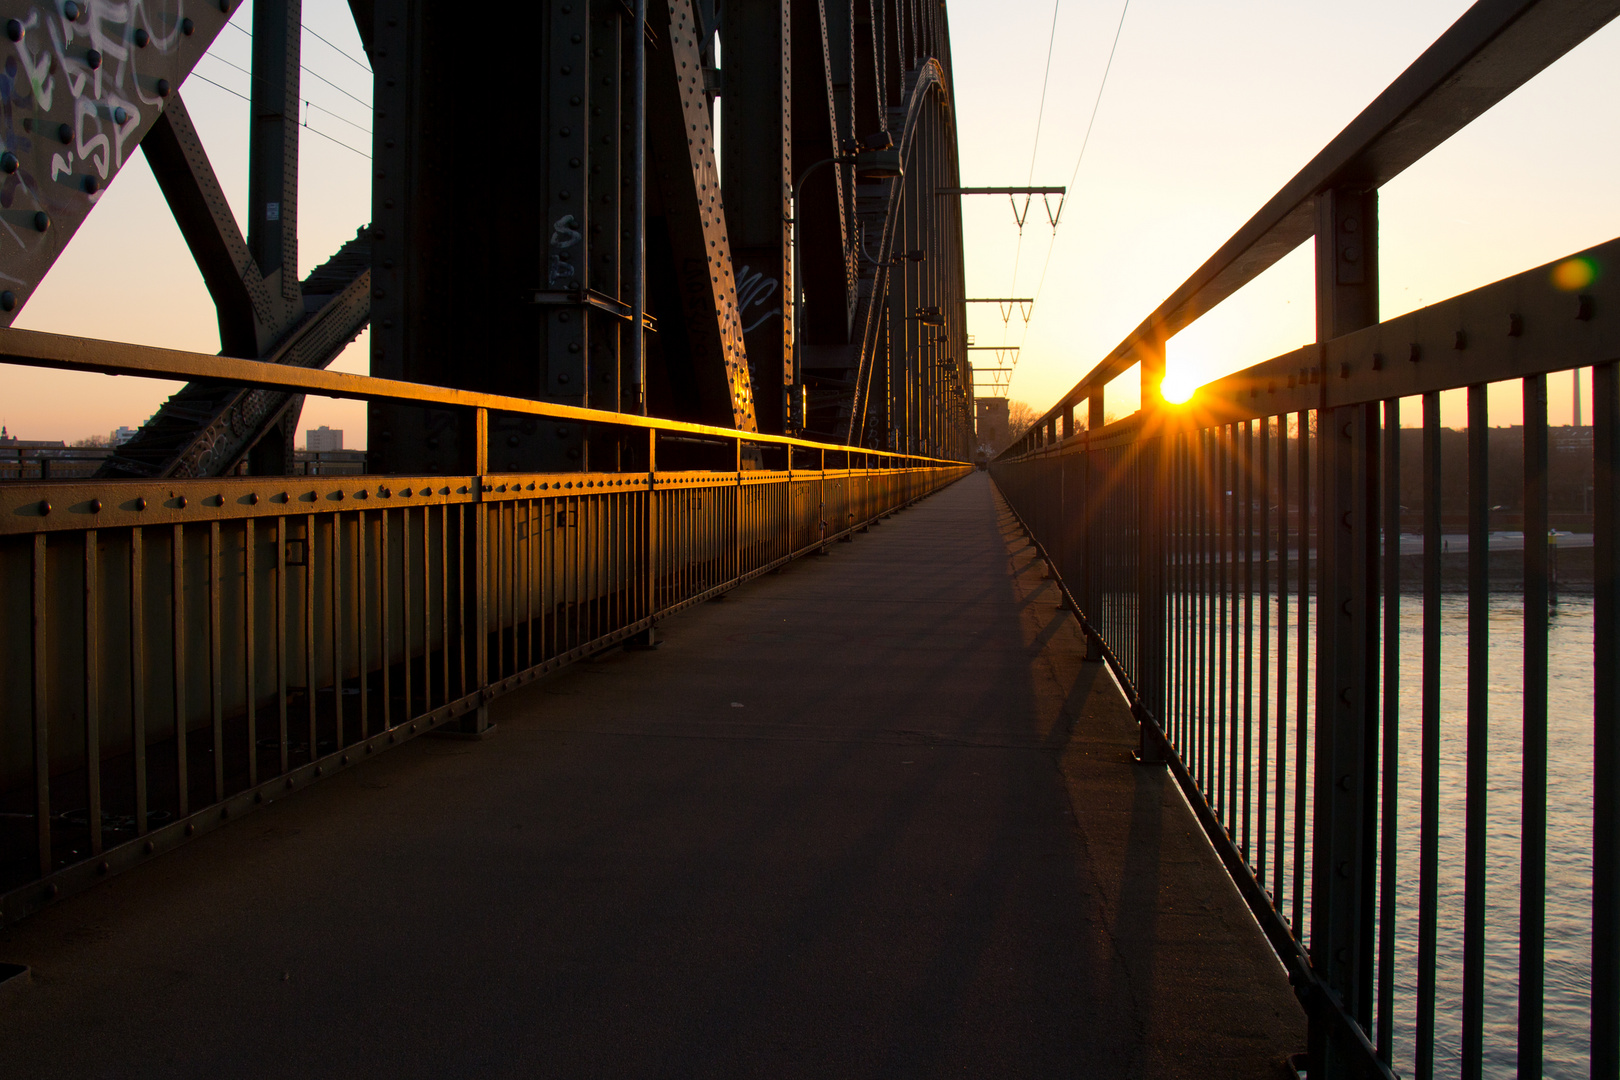 Südbrücke at dusk